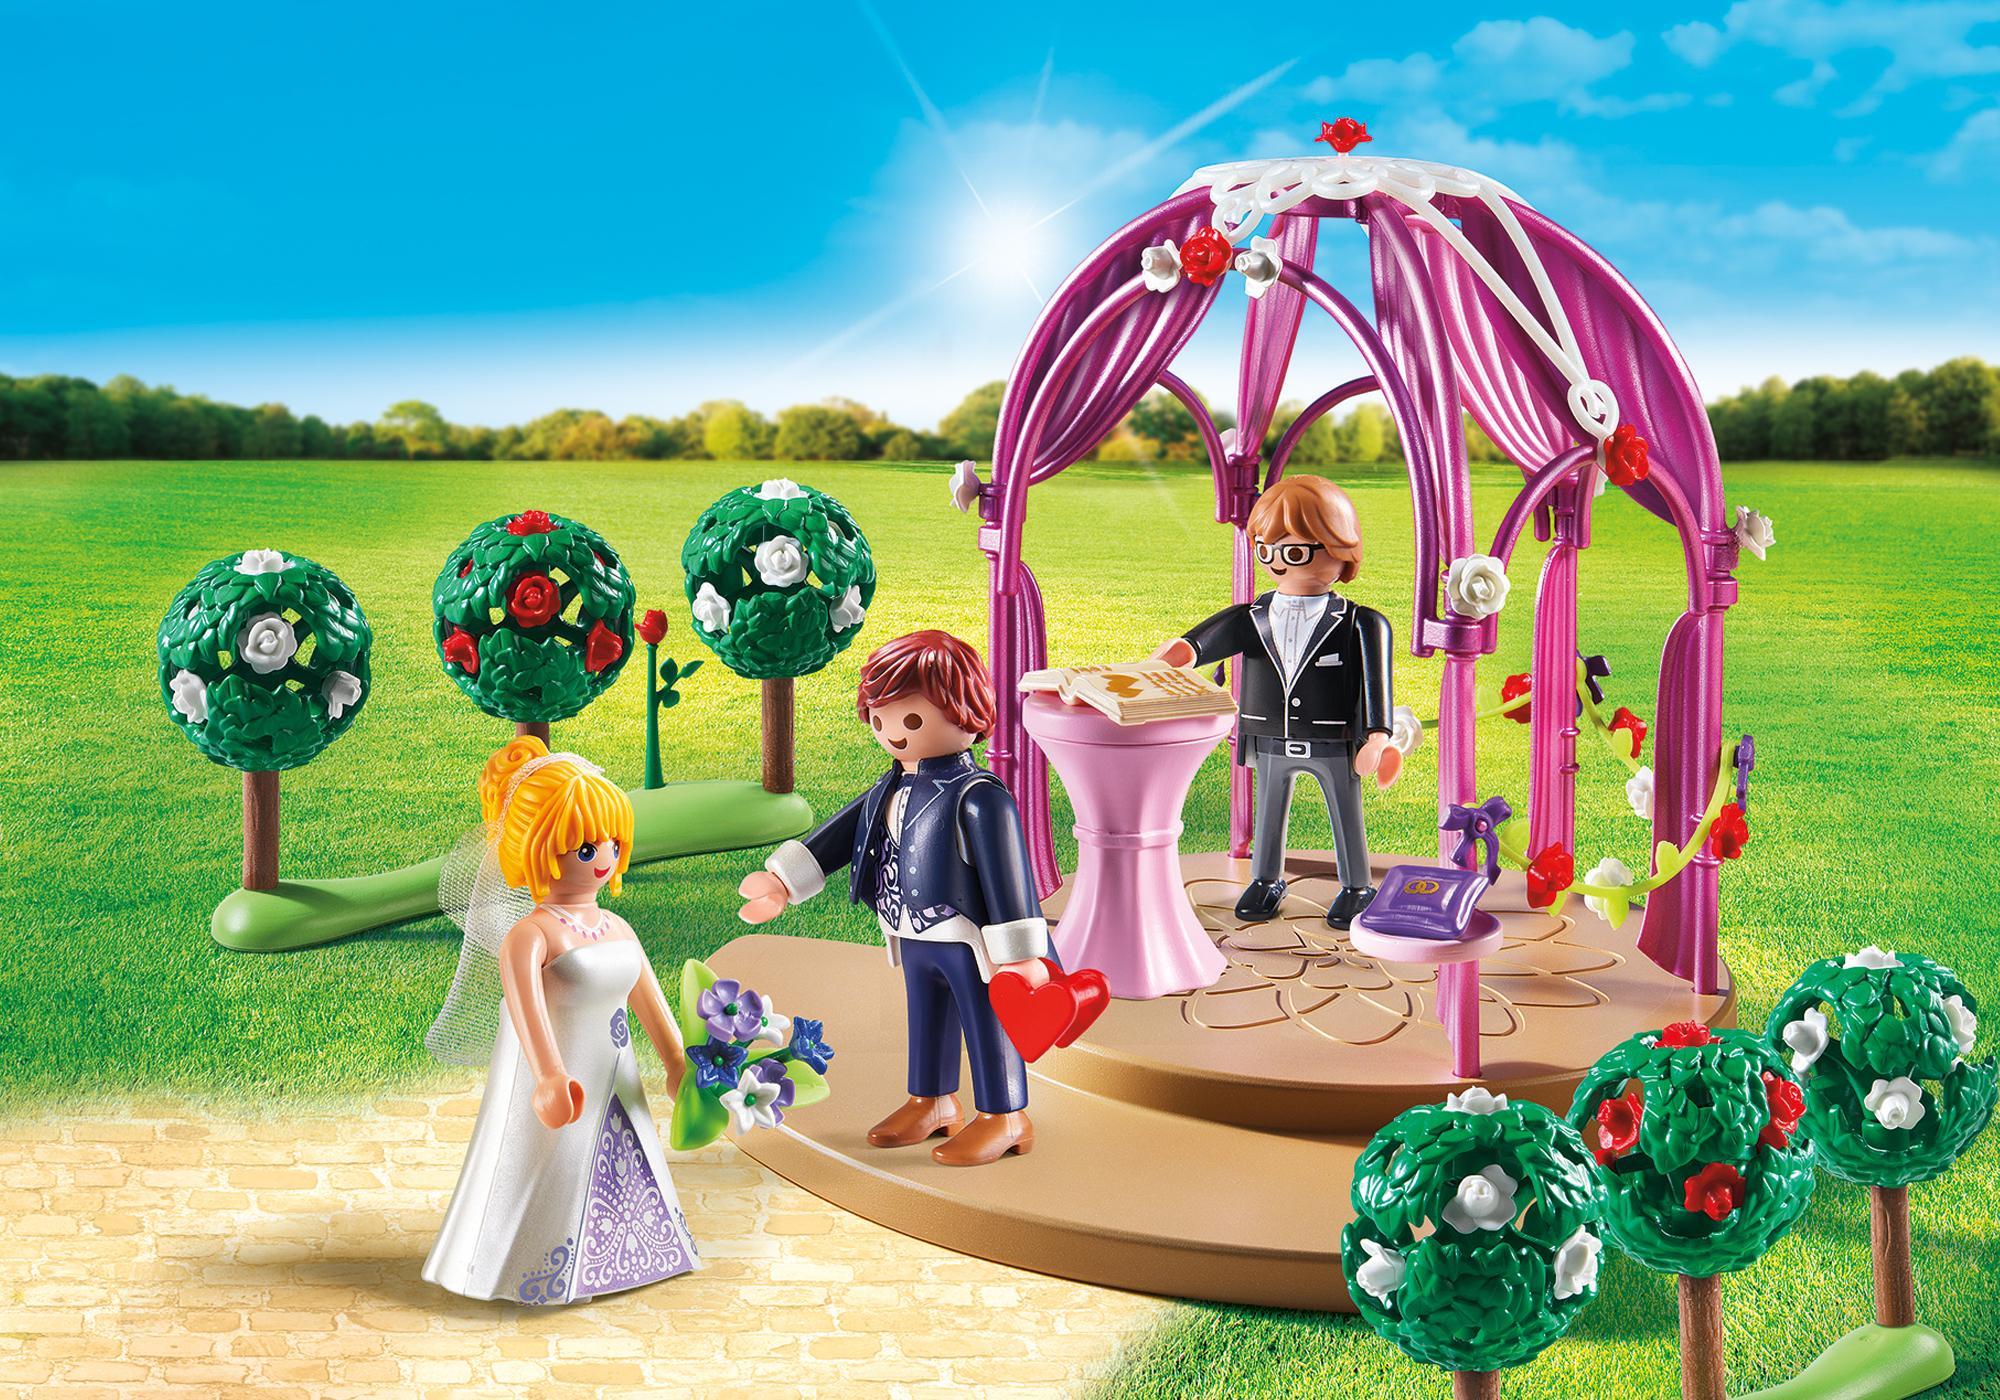 http://media.playmobil.com/i/playmobil/9229_product_detail/Hochzeitspavillon mit Brautpaar